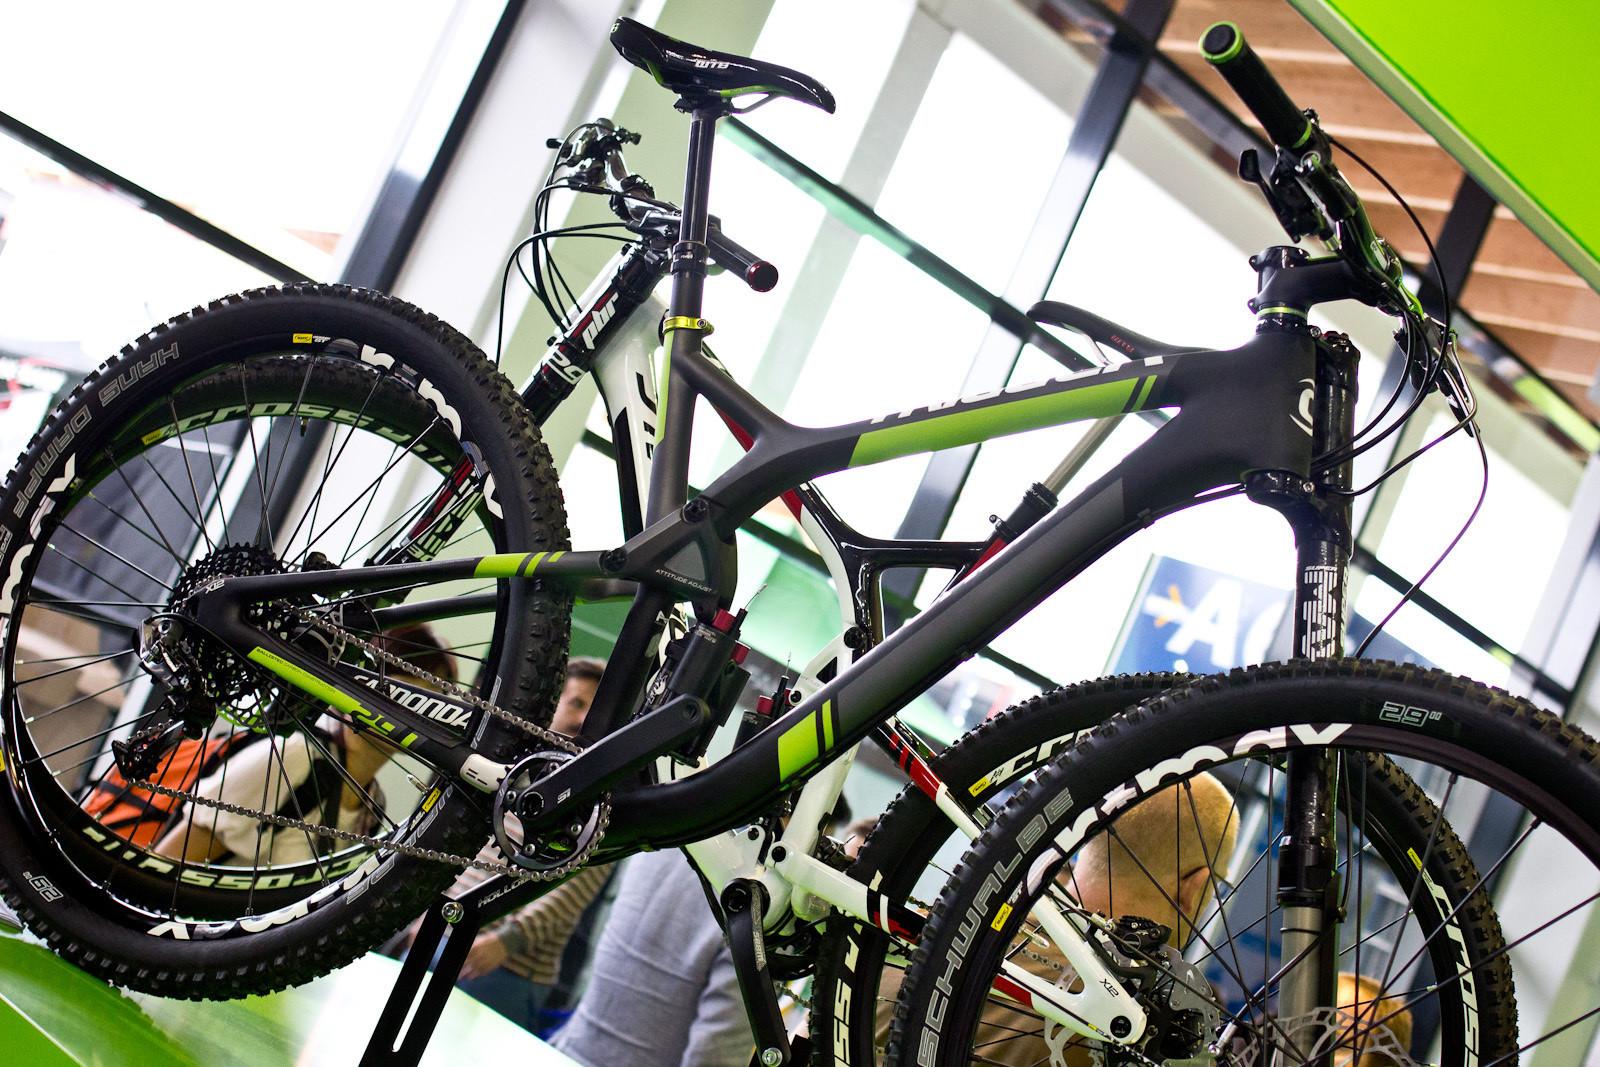 2014 Cannondale Trigger 29 Carbon - 2014 Trail, All-Mountain & Enduro Bikes at Eurobike 2013 - Mountain Biking Pictures - Vital MTB